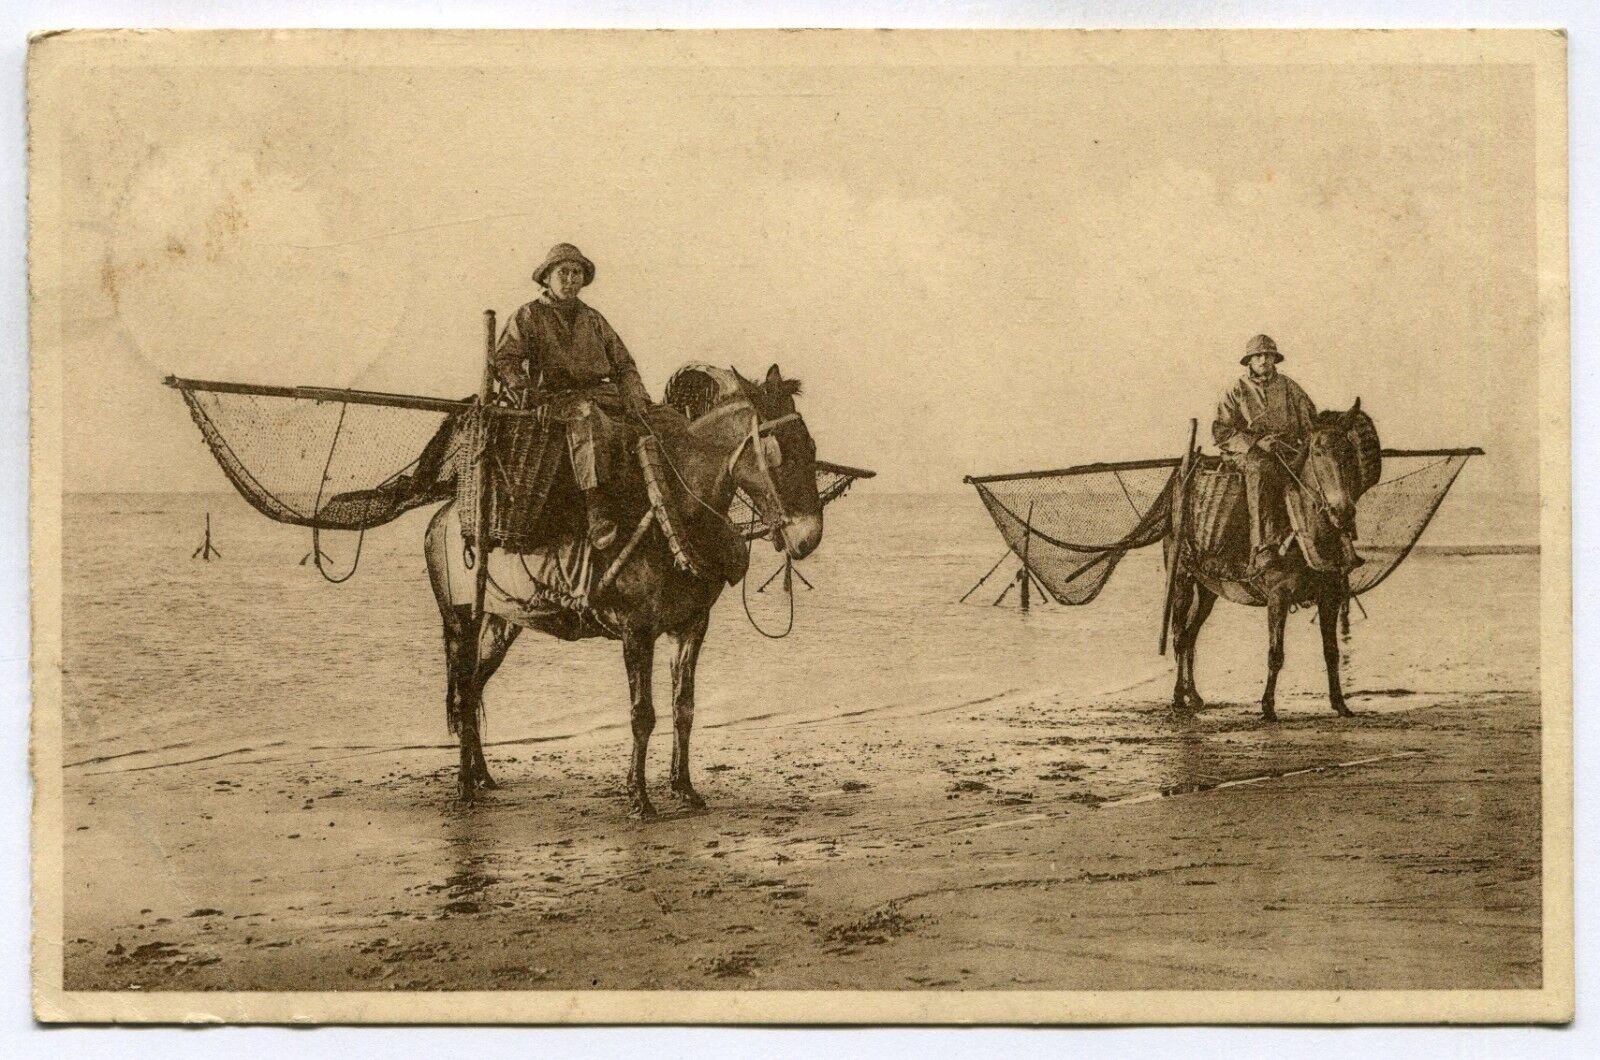 CPA - Carte Postale - Belgique - Blankenberge - Pêcheurs de Crevettes (SV6347)